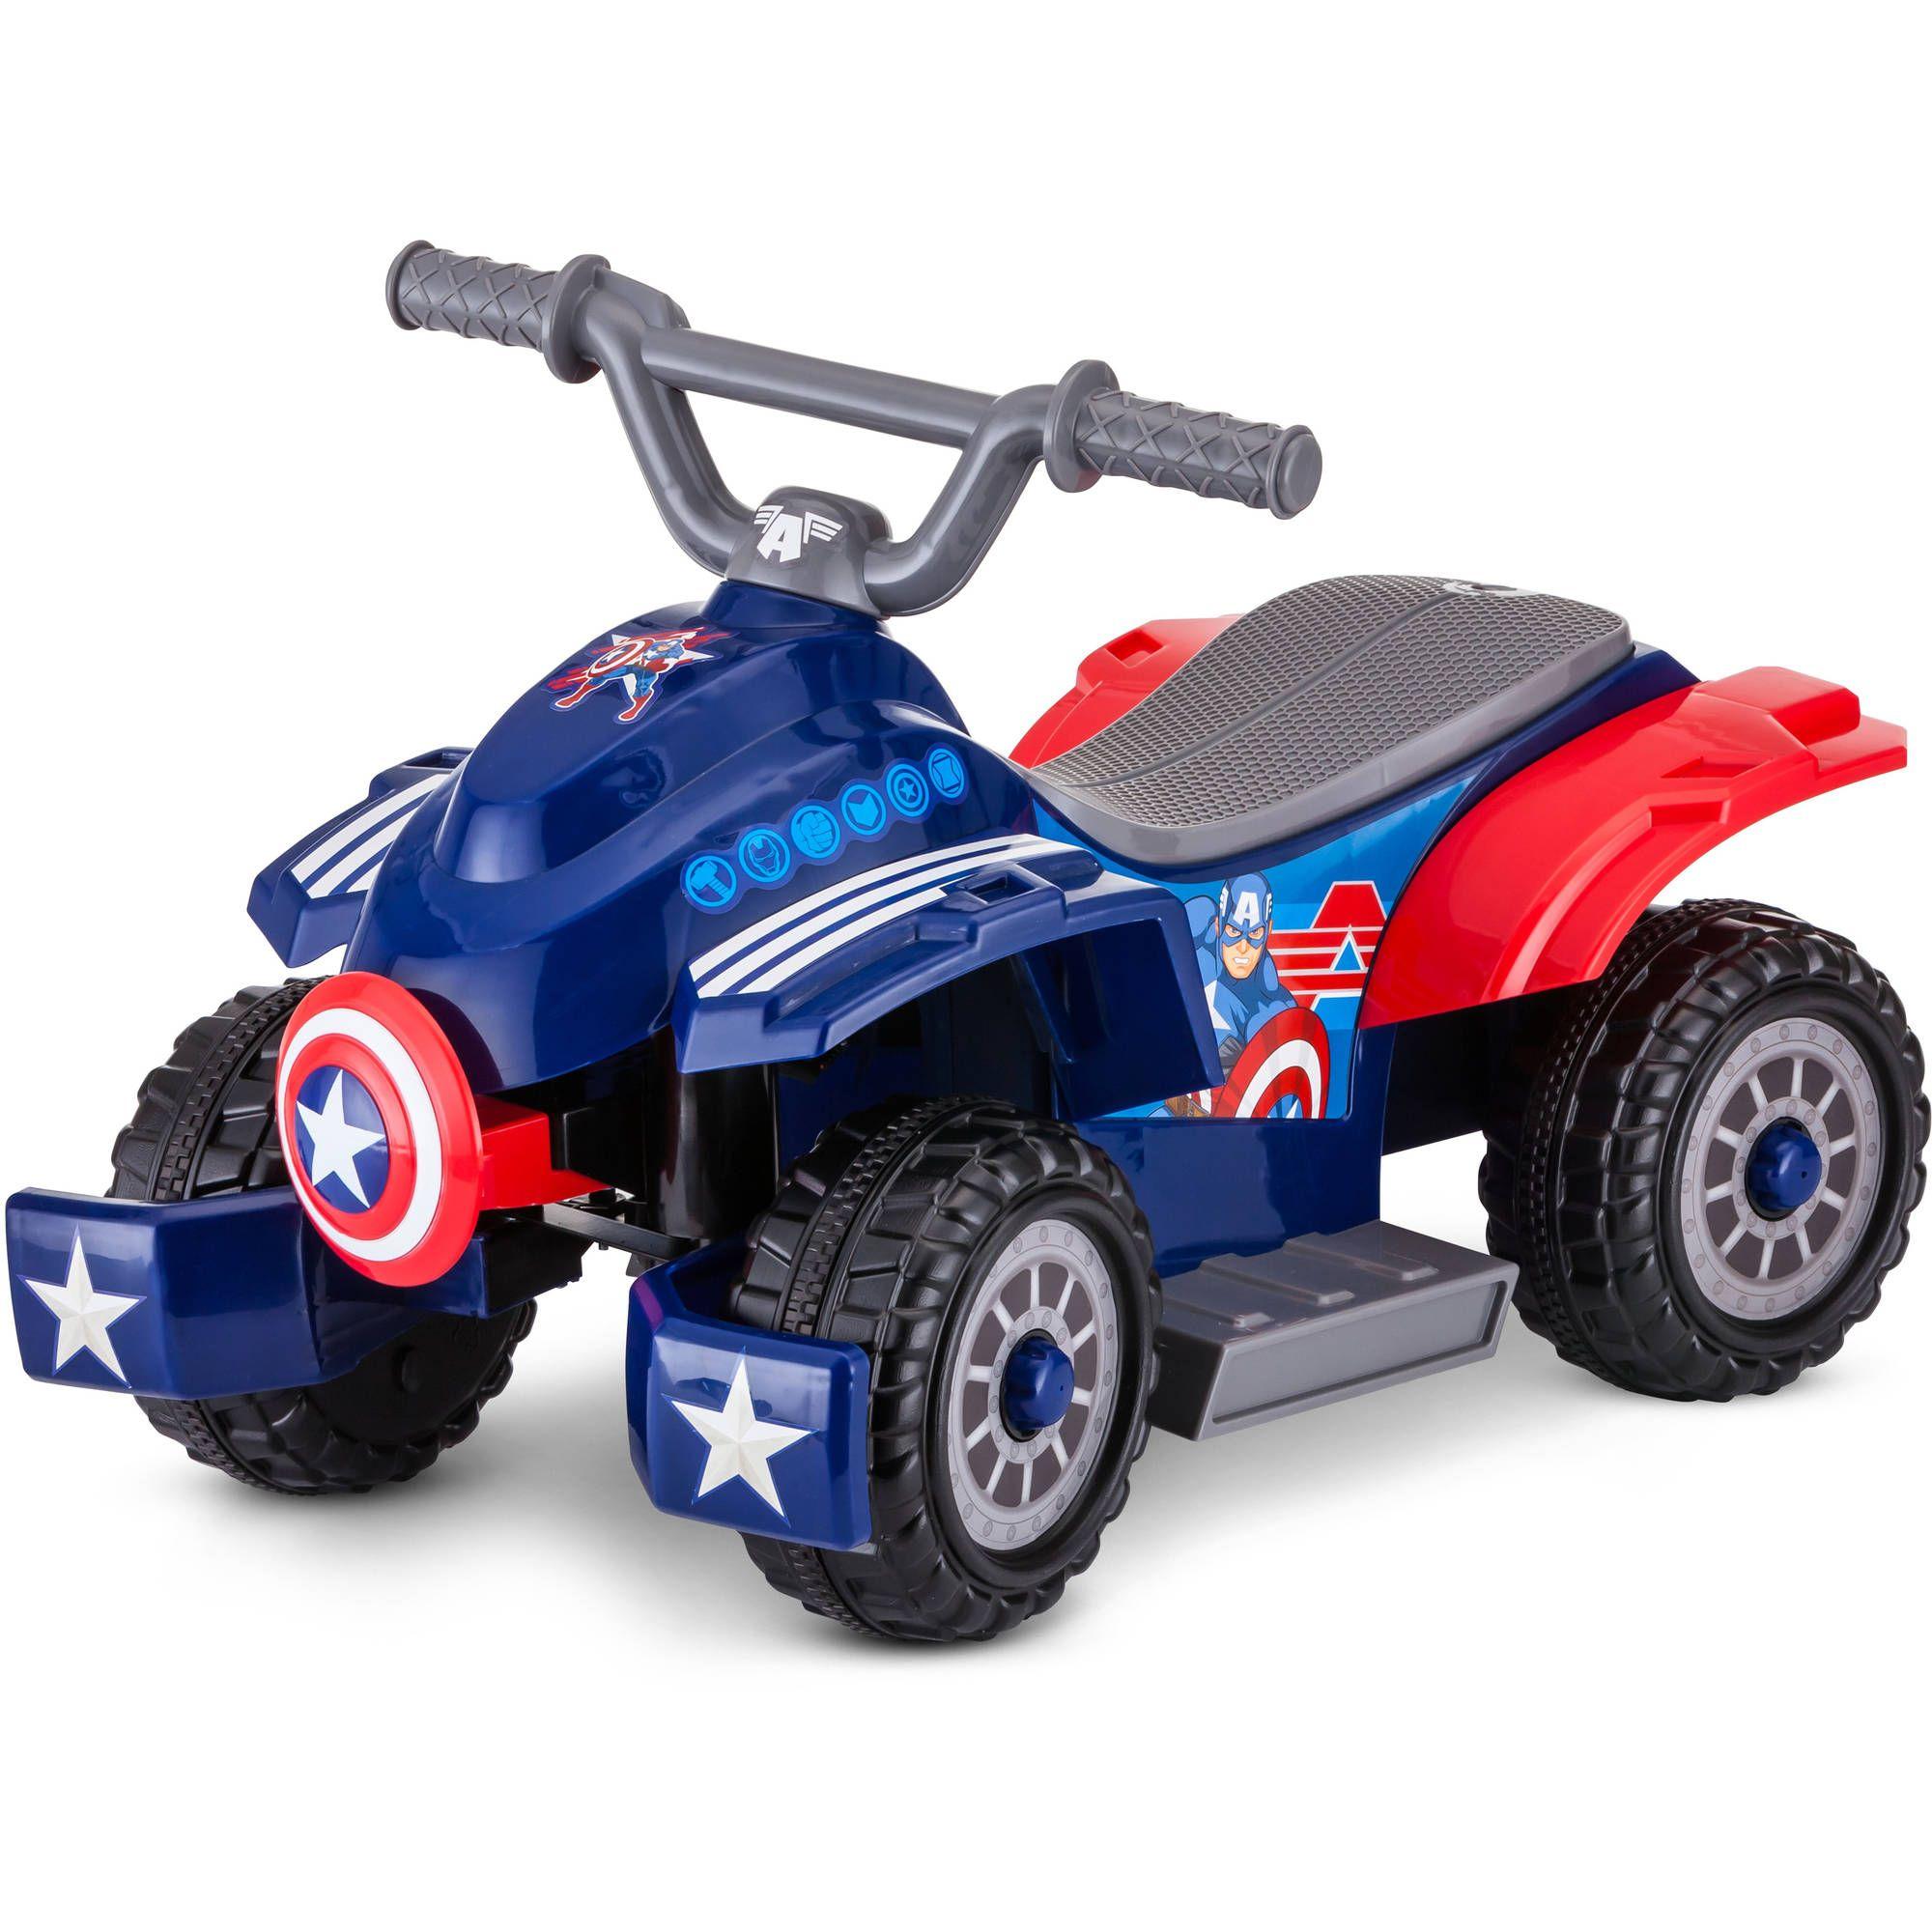 6v Marvel Captain America Toddler Quad Styles May Vary Walmart